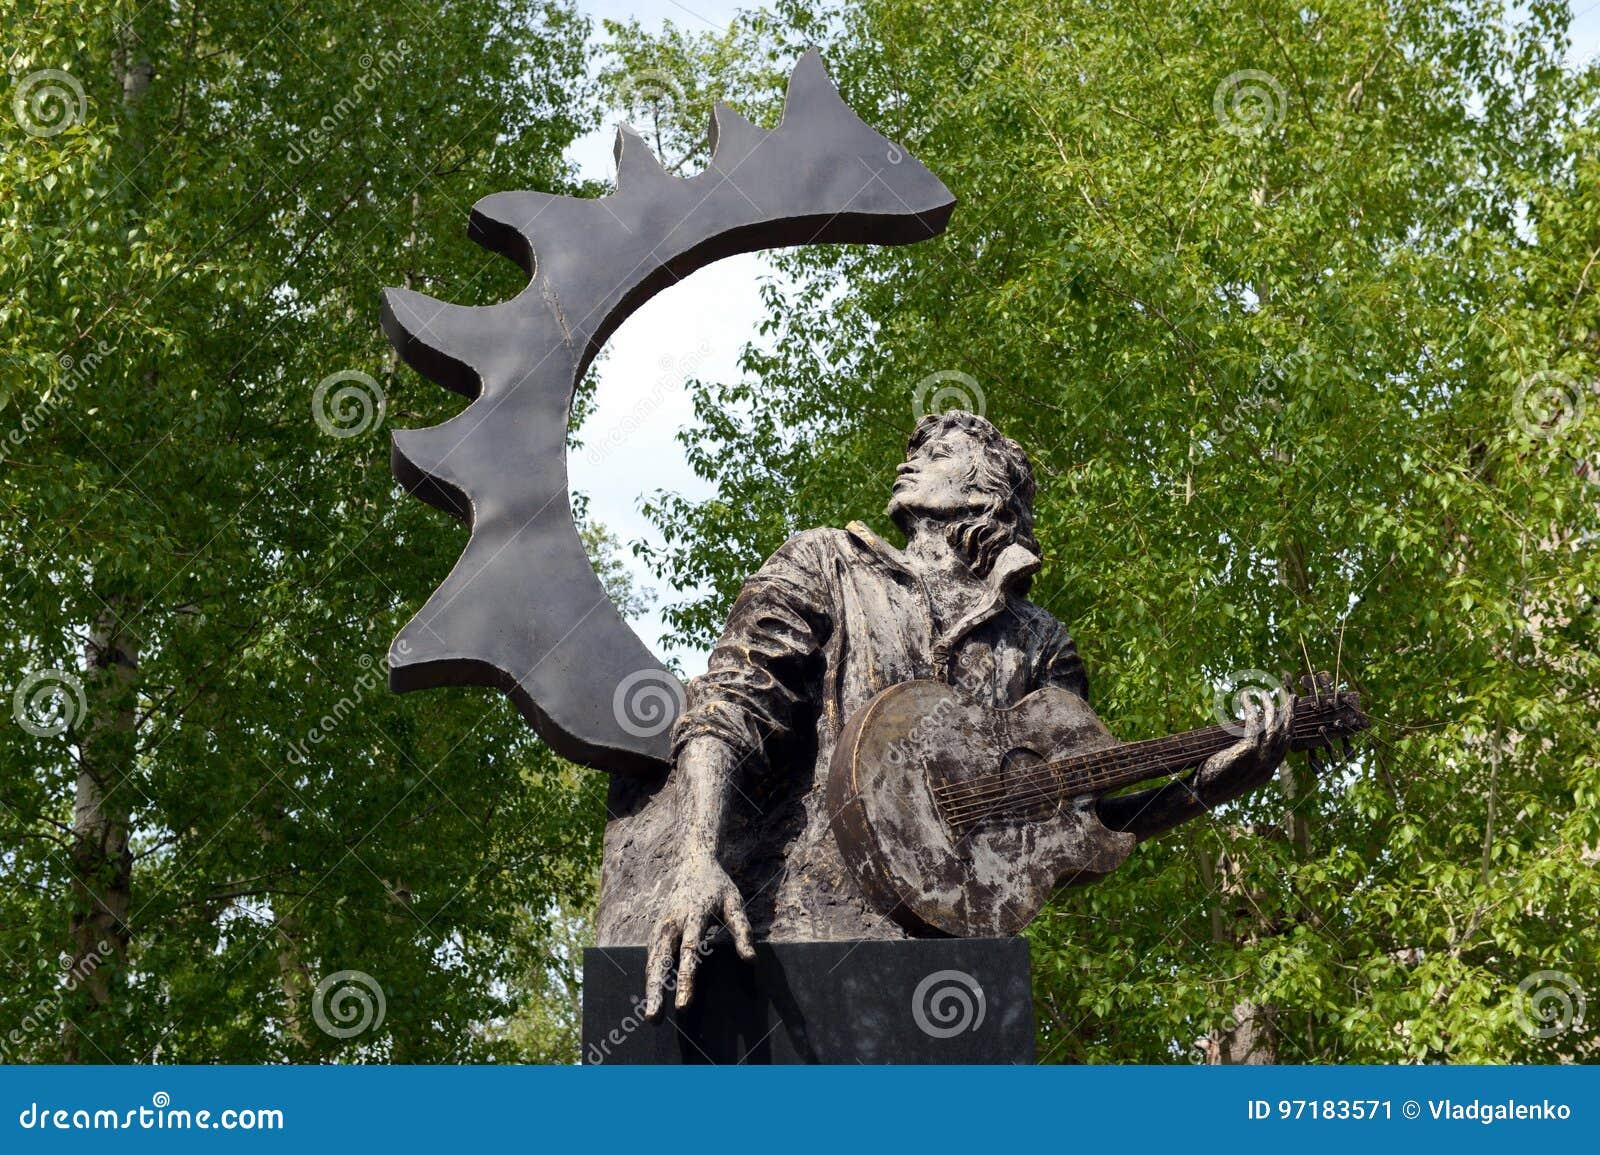 Monument to Viktor Tsoi will go to the Novgorod region 09/29/2015 94